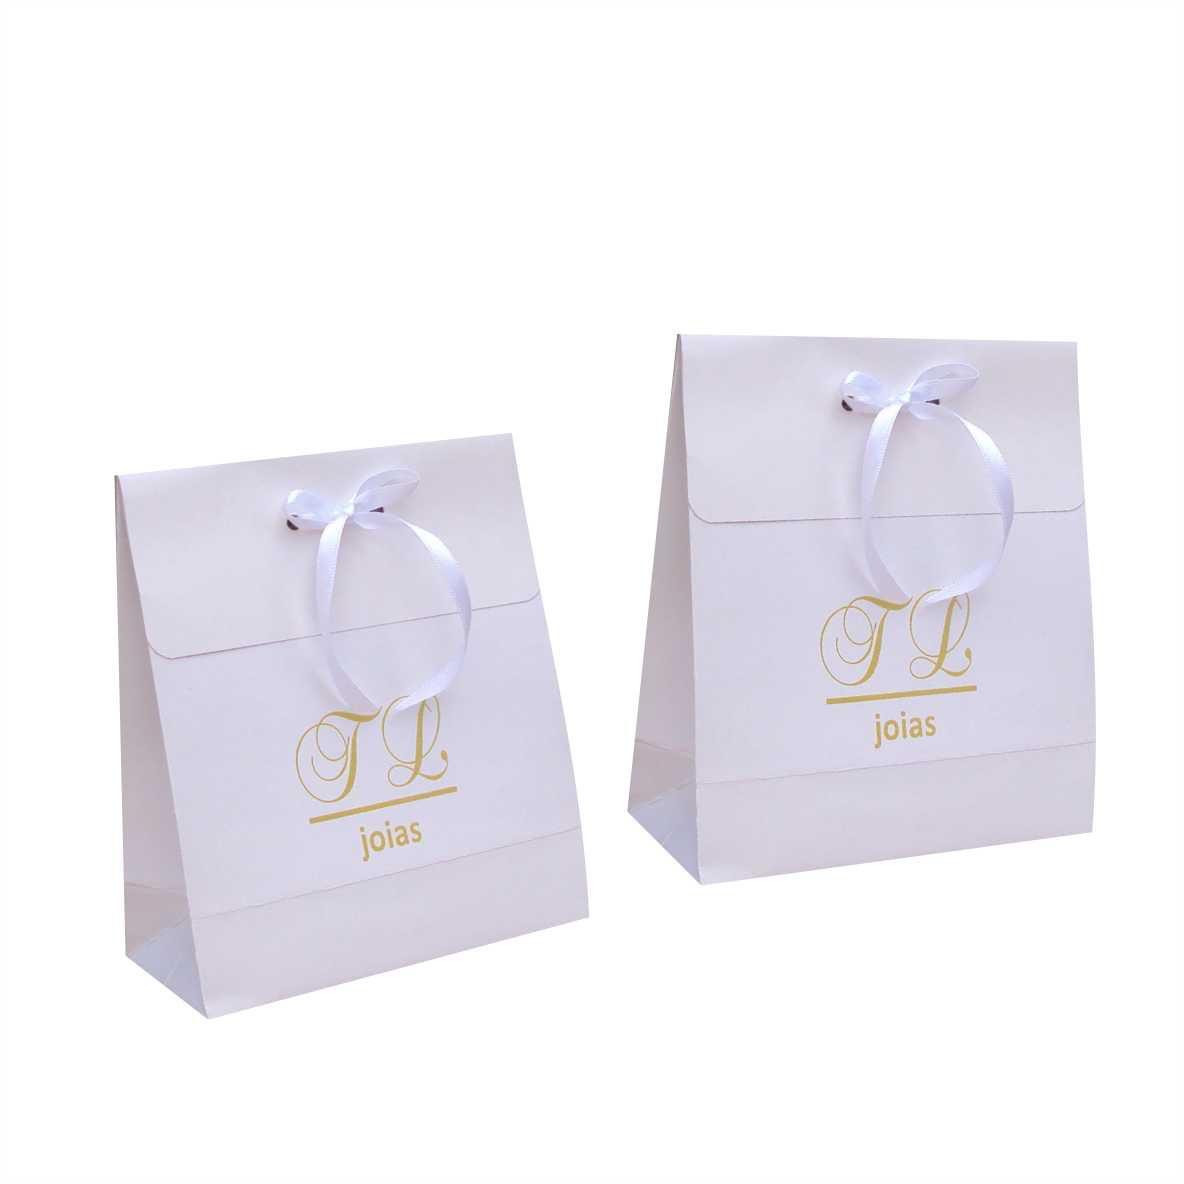 Sacola de papel branca pequena - personalizada para bijuterias (15x17x6,5 cm) 100 unidades